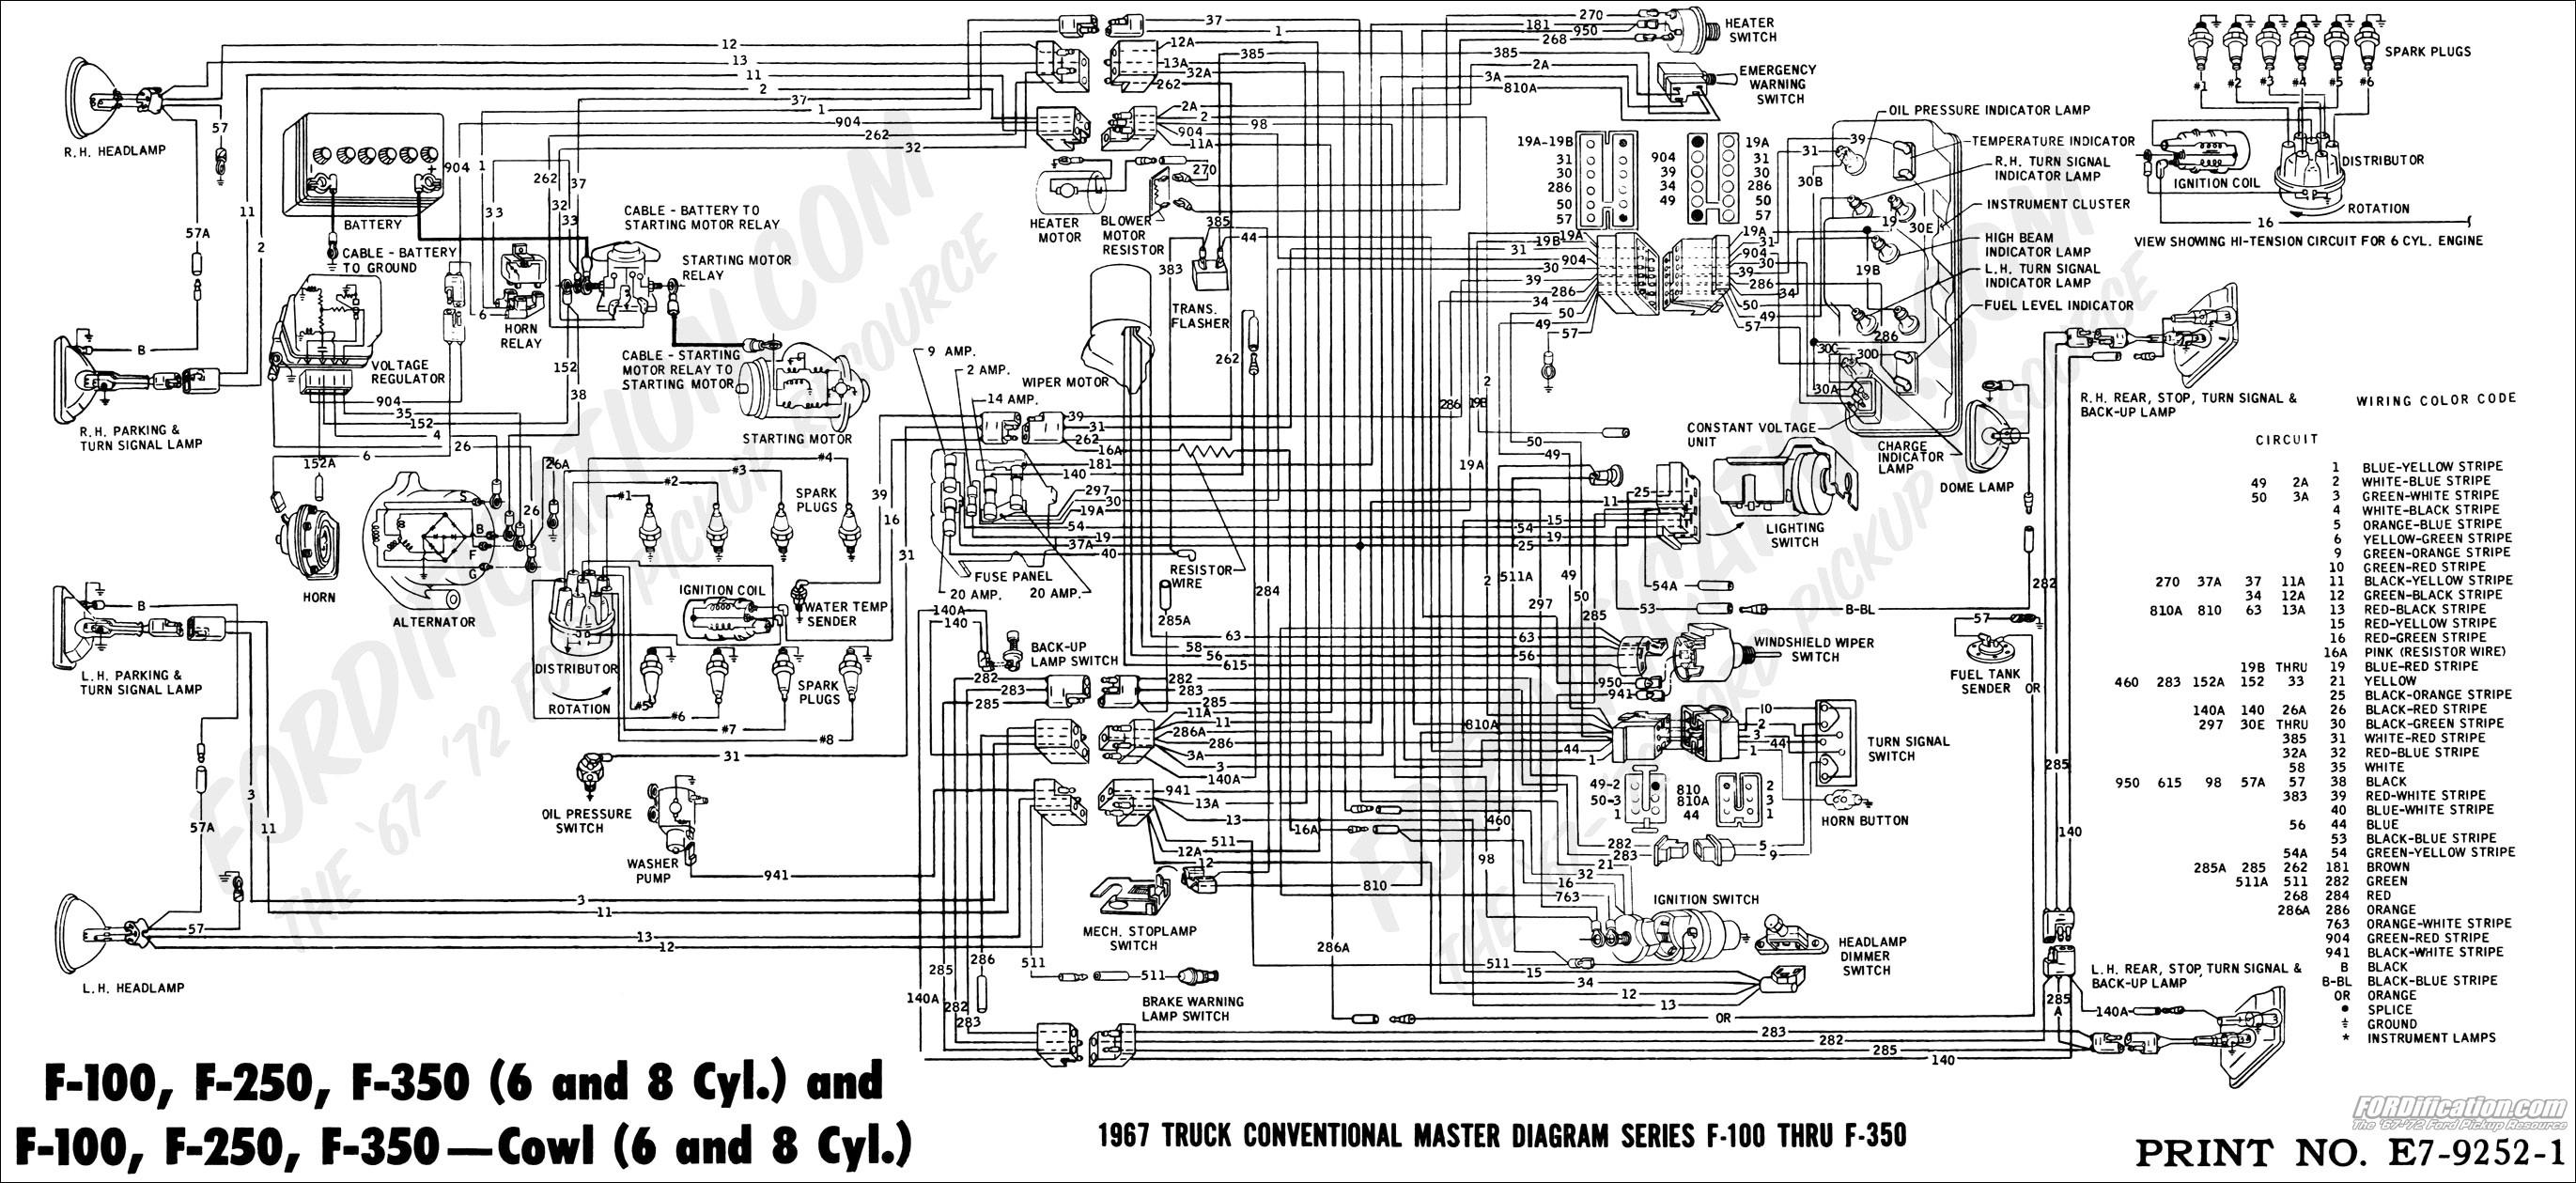 1990 F150 Wiring Diagram Wiring Diagram 2014 Ford F 150 Wiring Diagram 1990 Ford F 150 Wiring Diagram